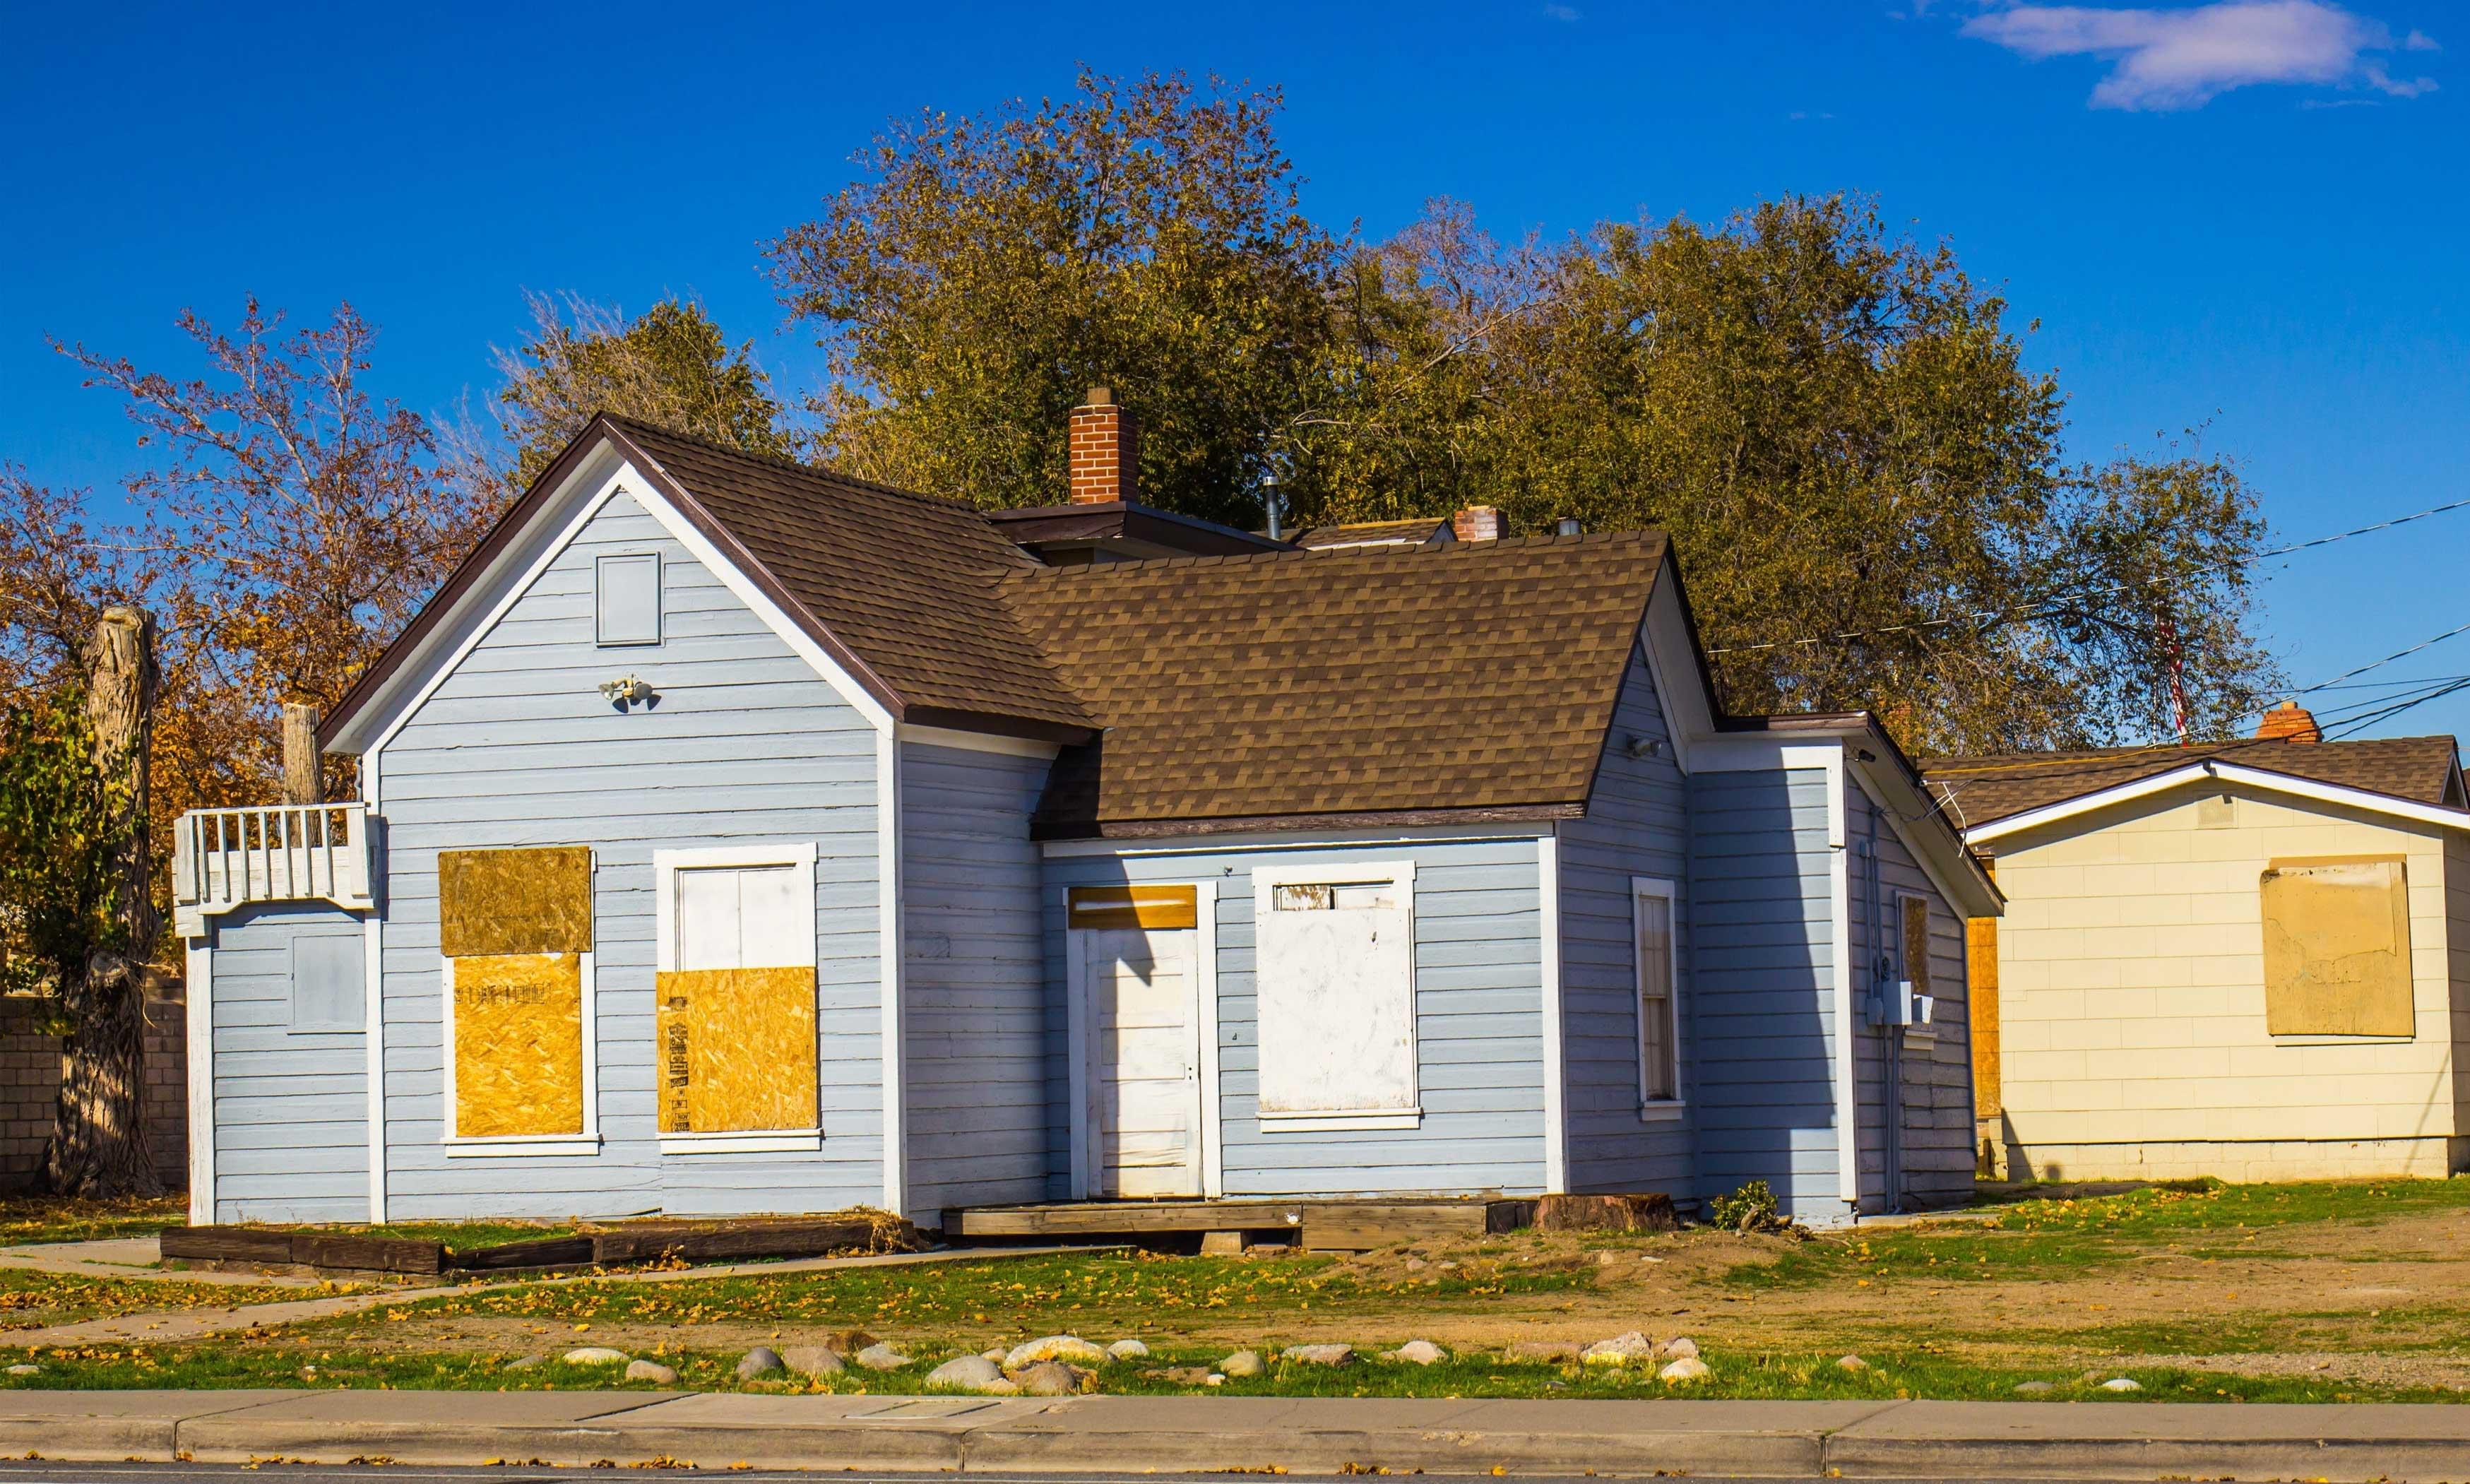 GAAR Helps City of Albuquerque Revise Housing Code